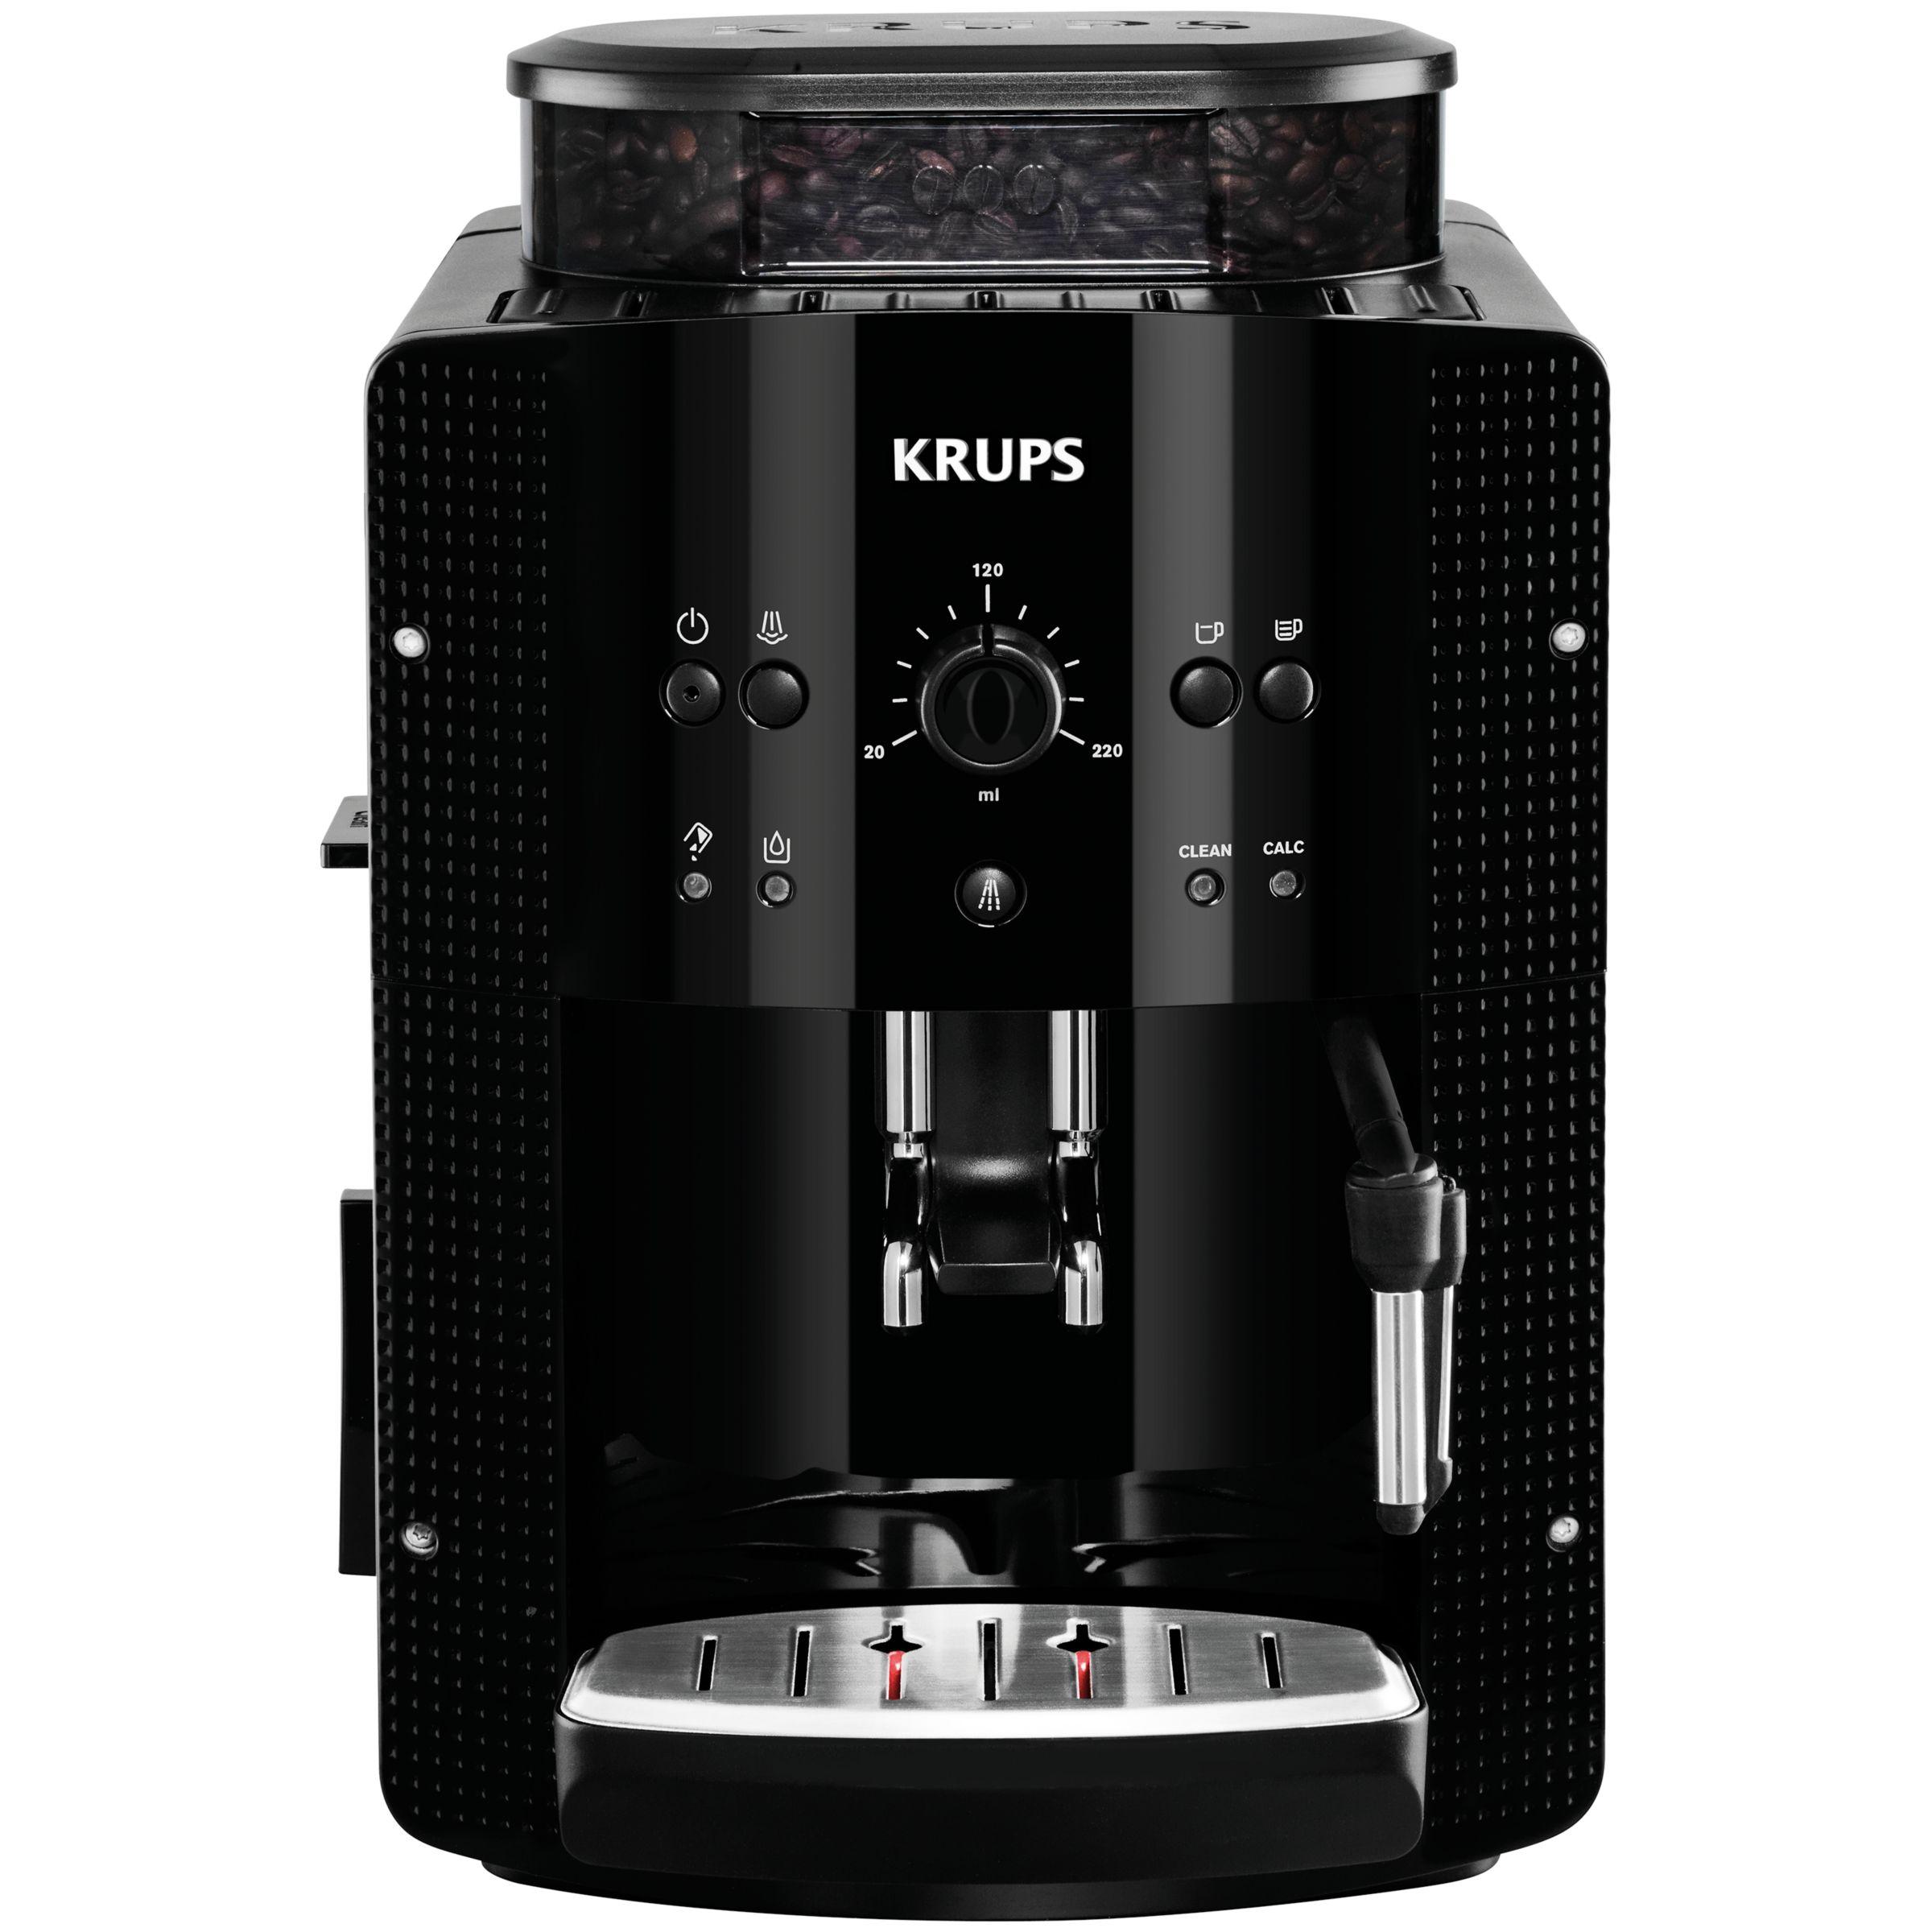 Krups KRUPS EA8108 Espresseria Bean-to-Cup Coffee Machine, Black